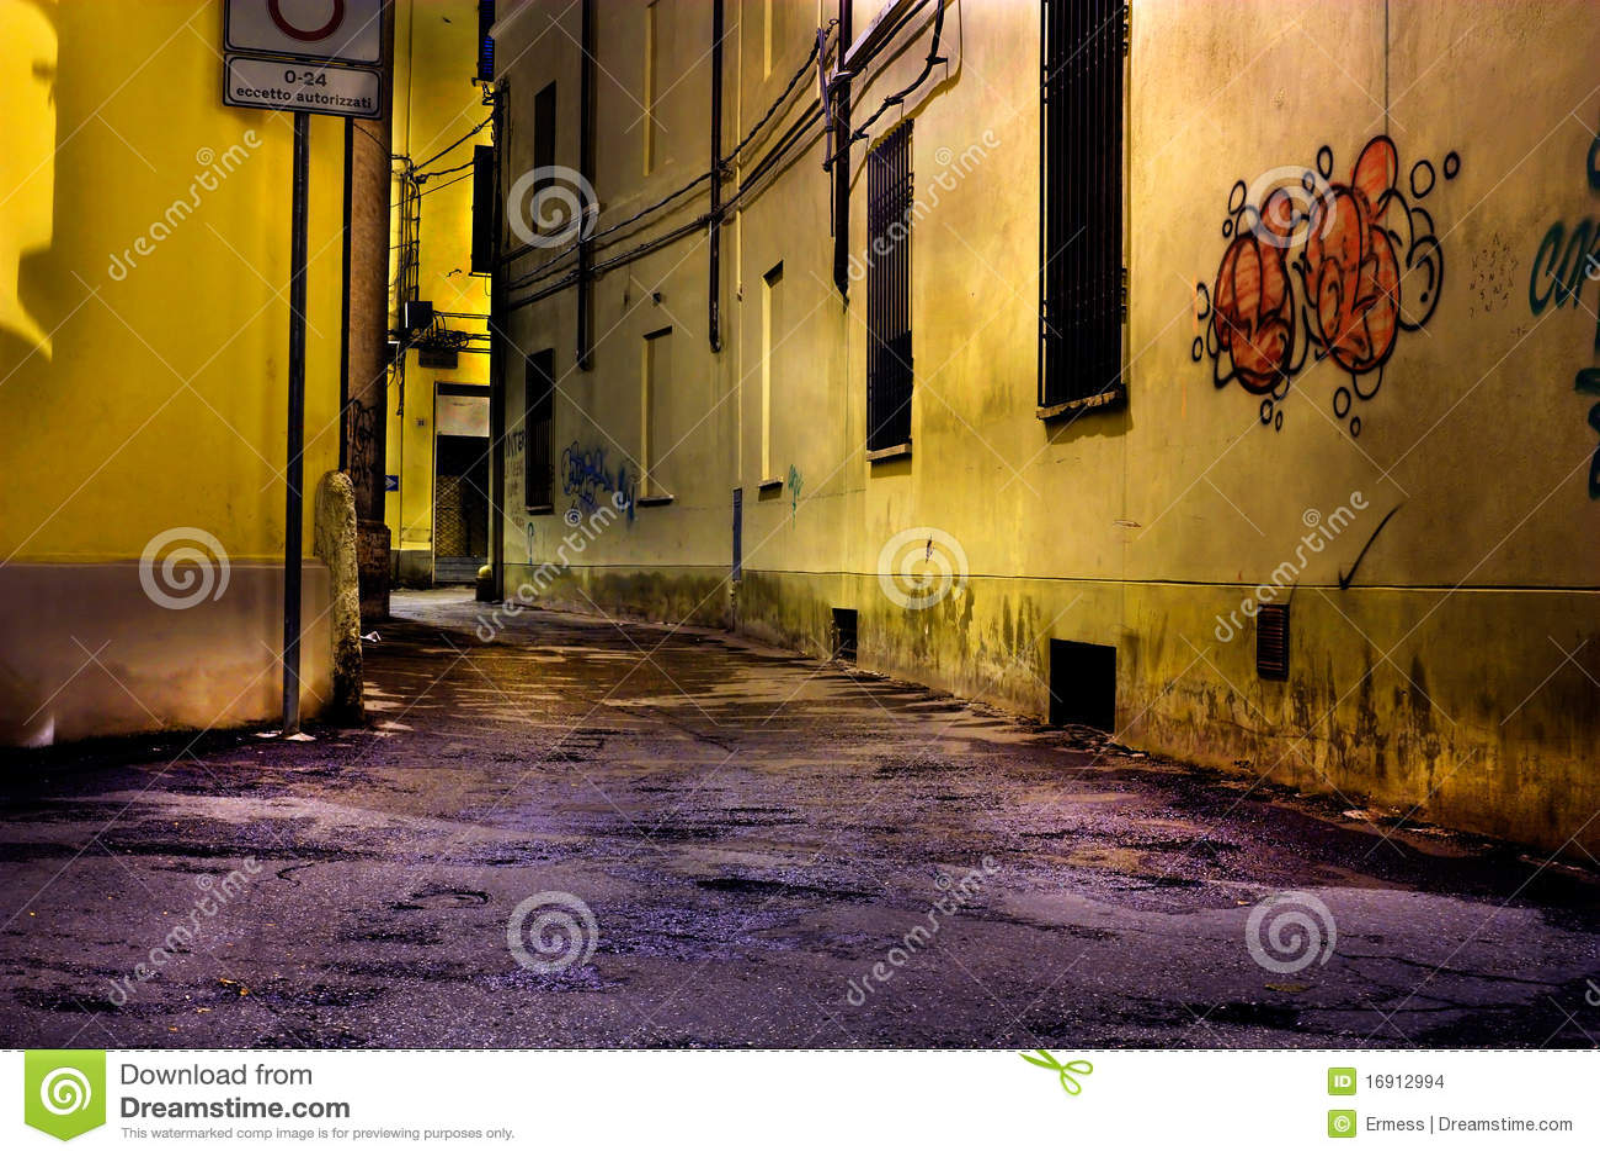 Download Dirty corner stock photo. Image of alleyway, abandoned - 16912994